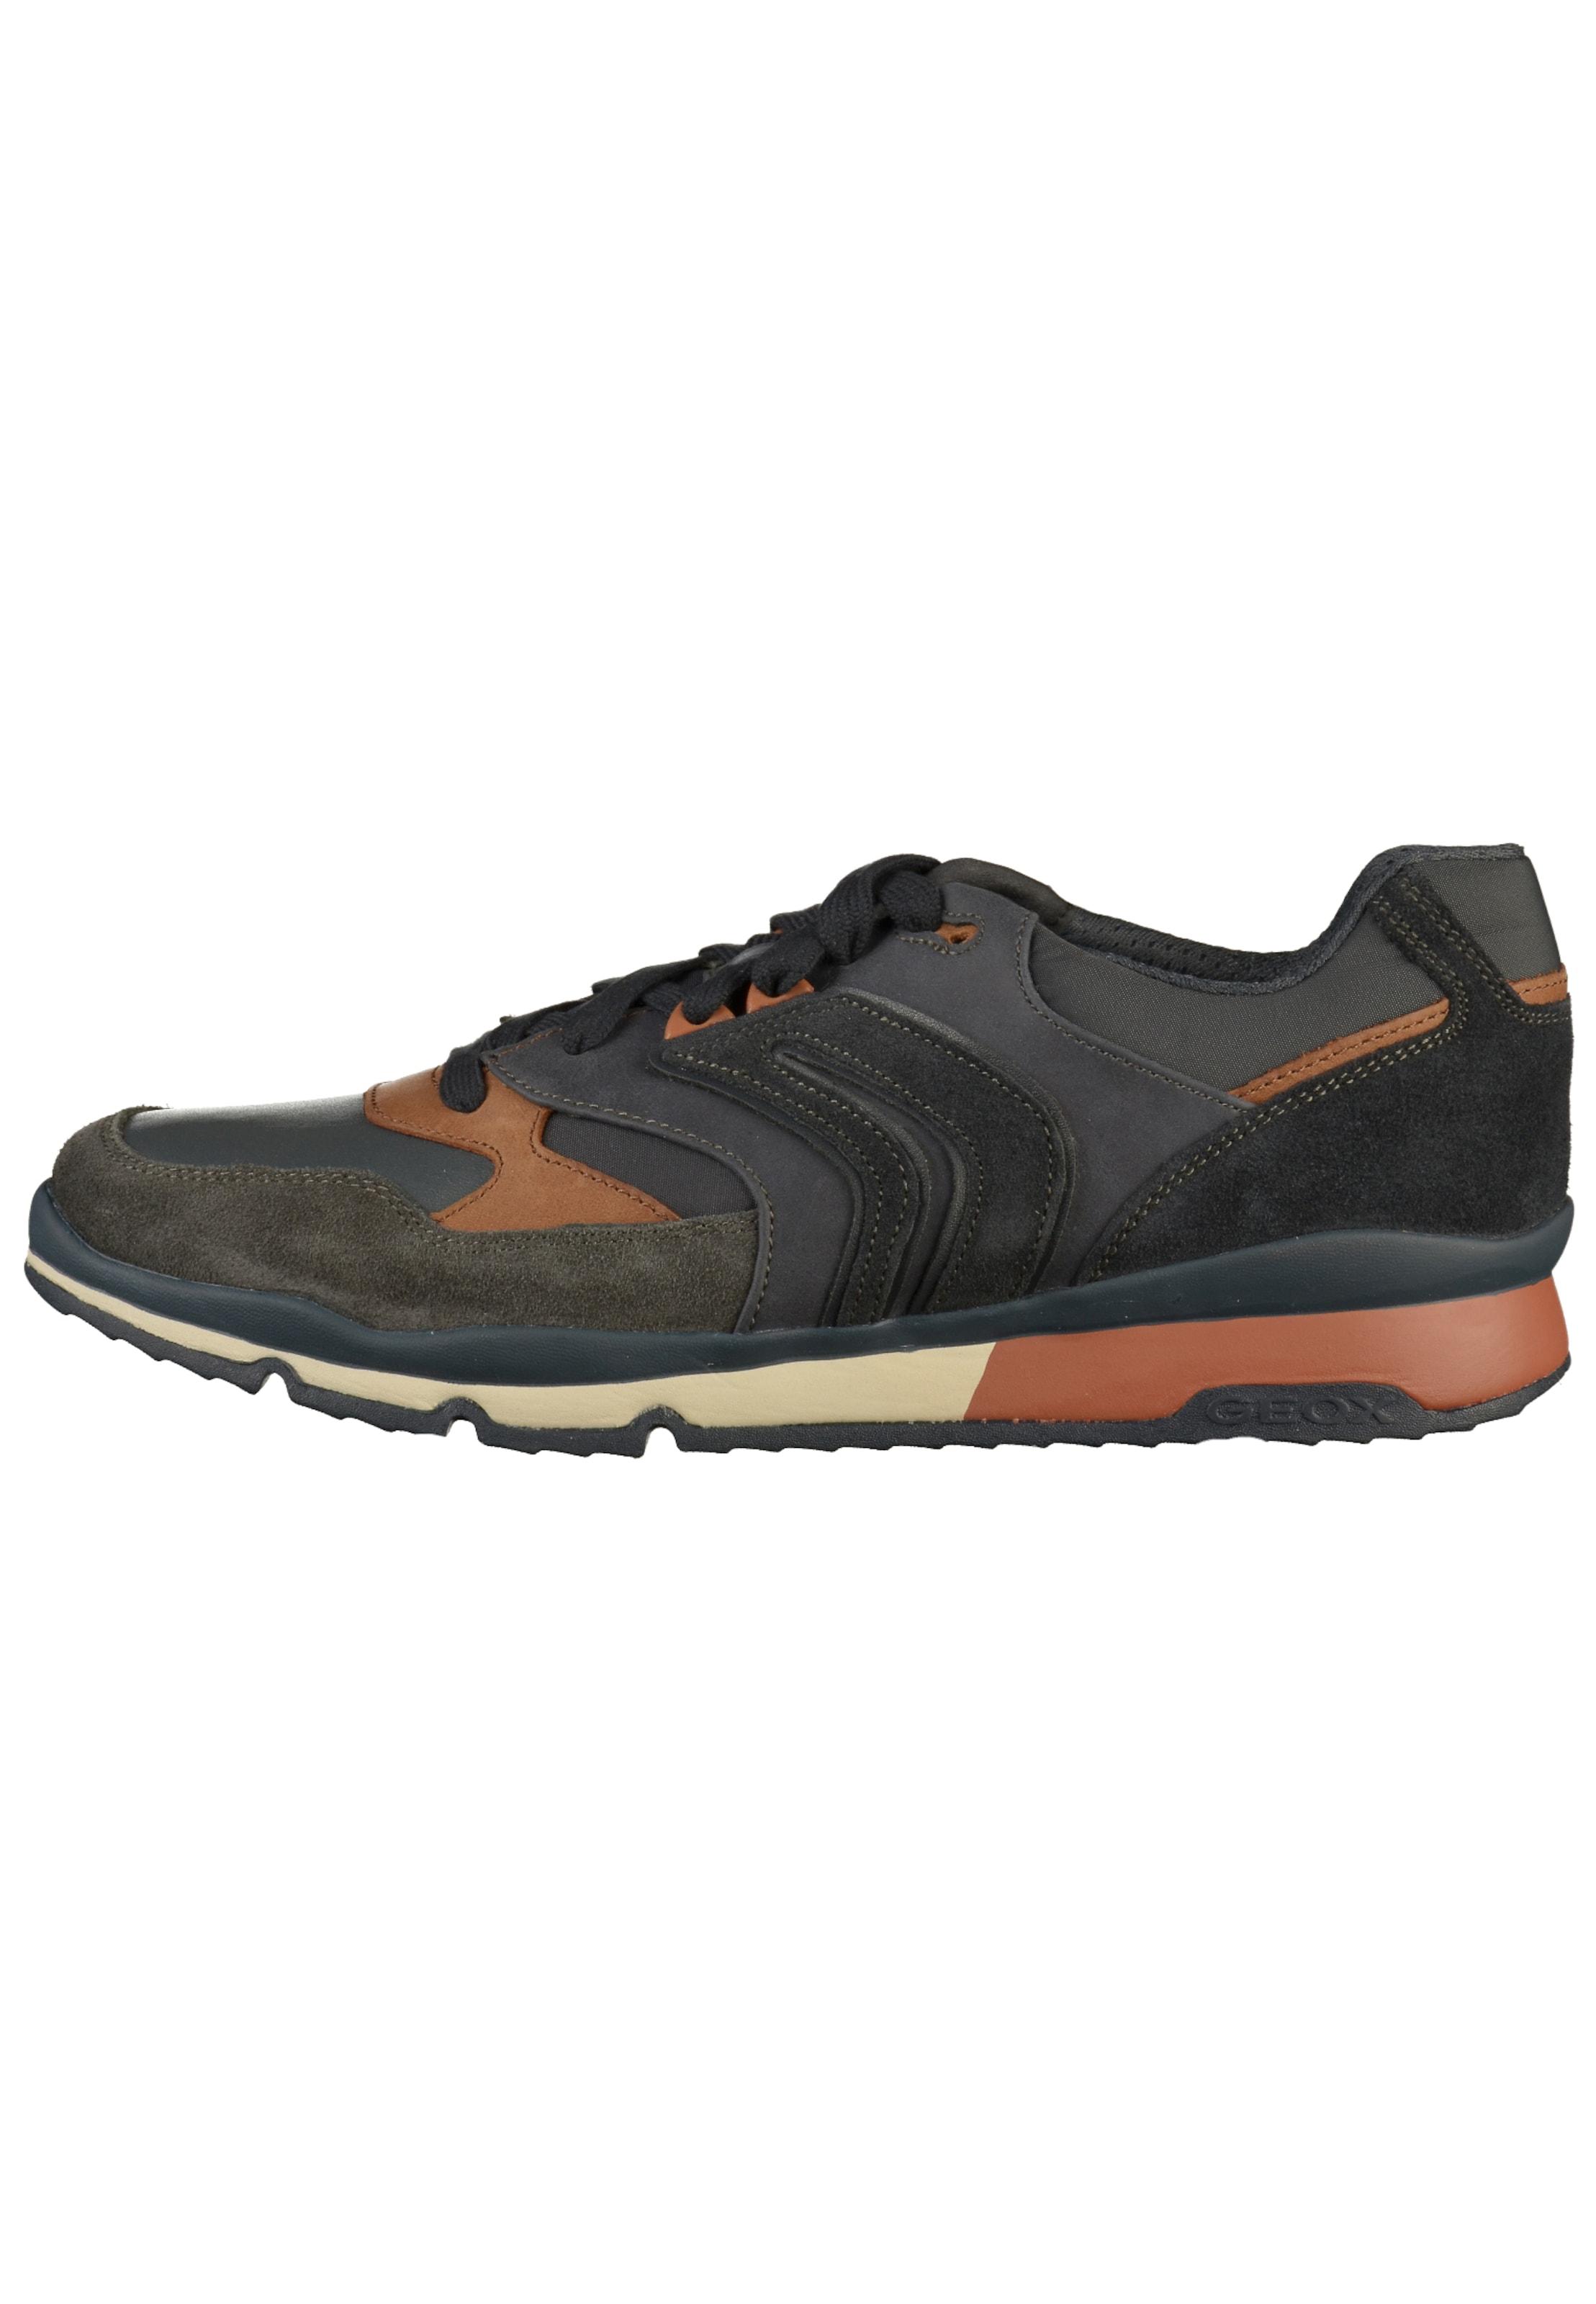 Sneaker Geox Geox In Oliv NavyHellbraun Sneaker NavyHellbraun Geox In Sneaker Oliv 34ARLc5jq